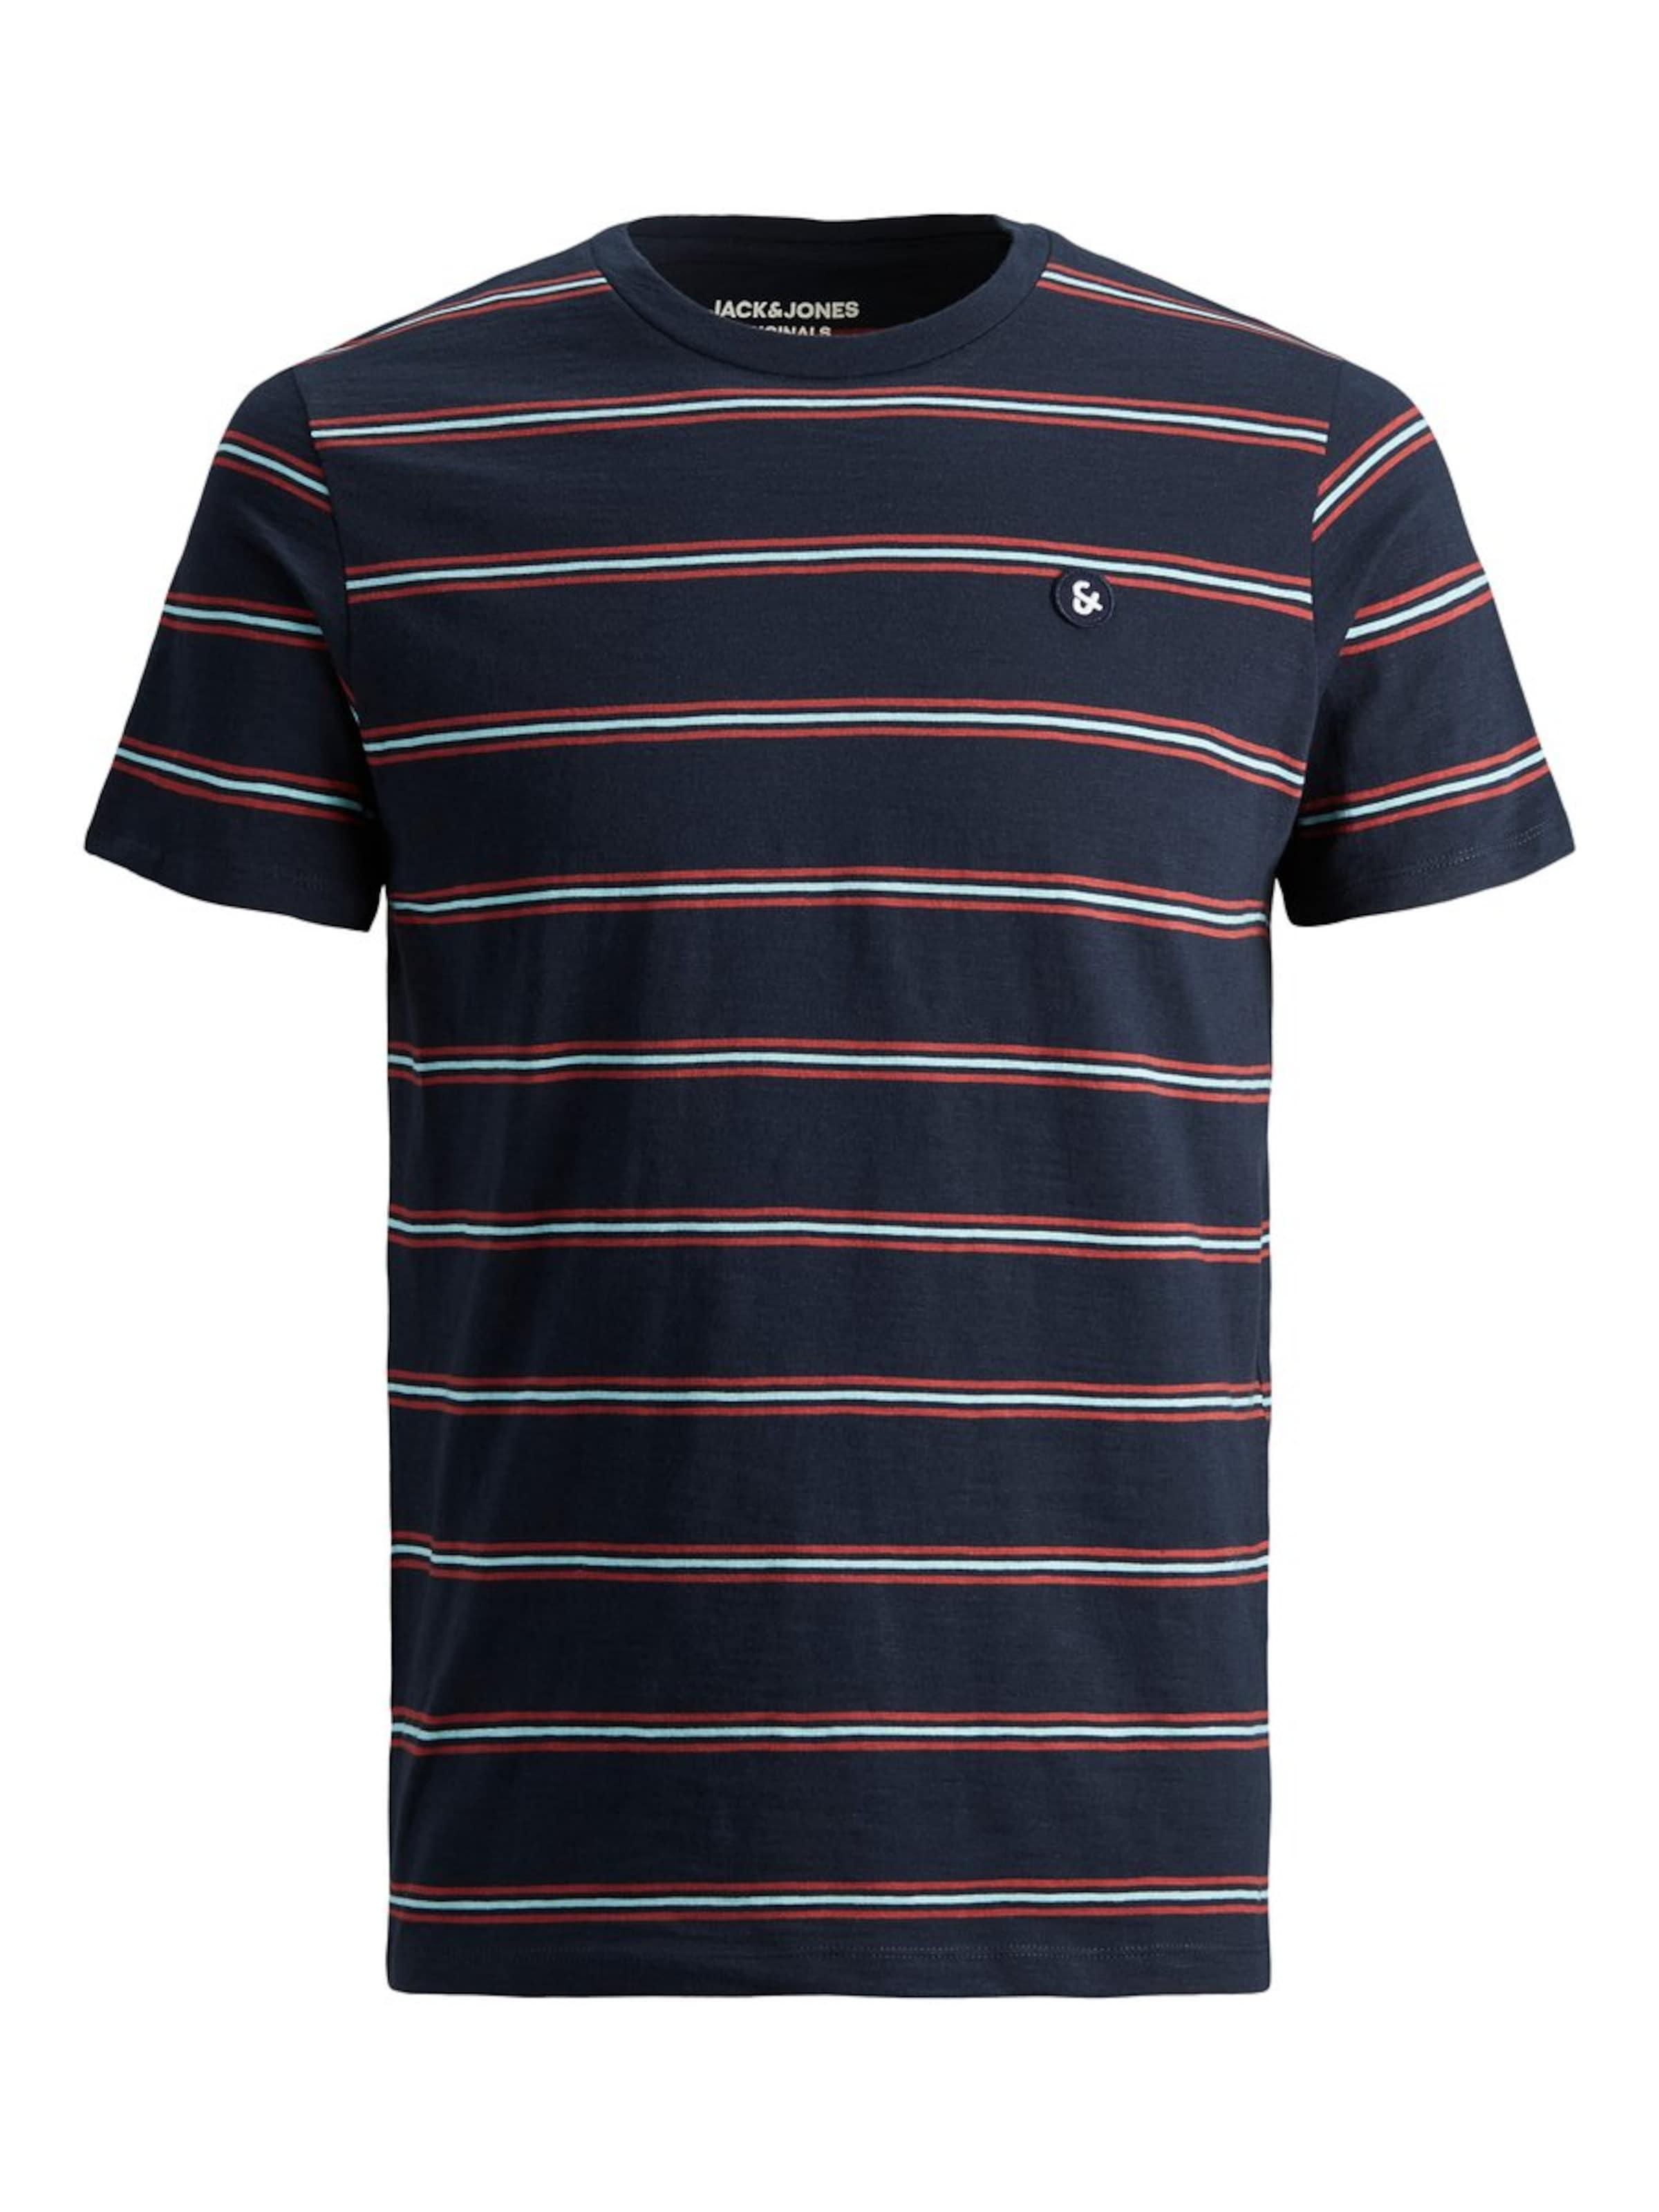 BleuSafran Jackamp; shirt Chiné En Jones T Blanc OPwTkiXZu